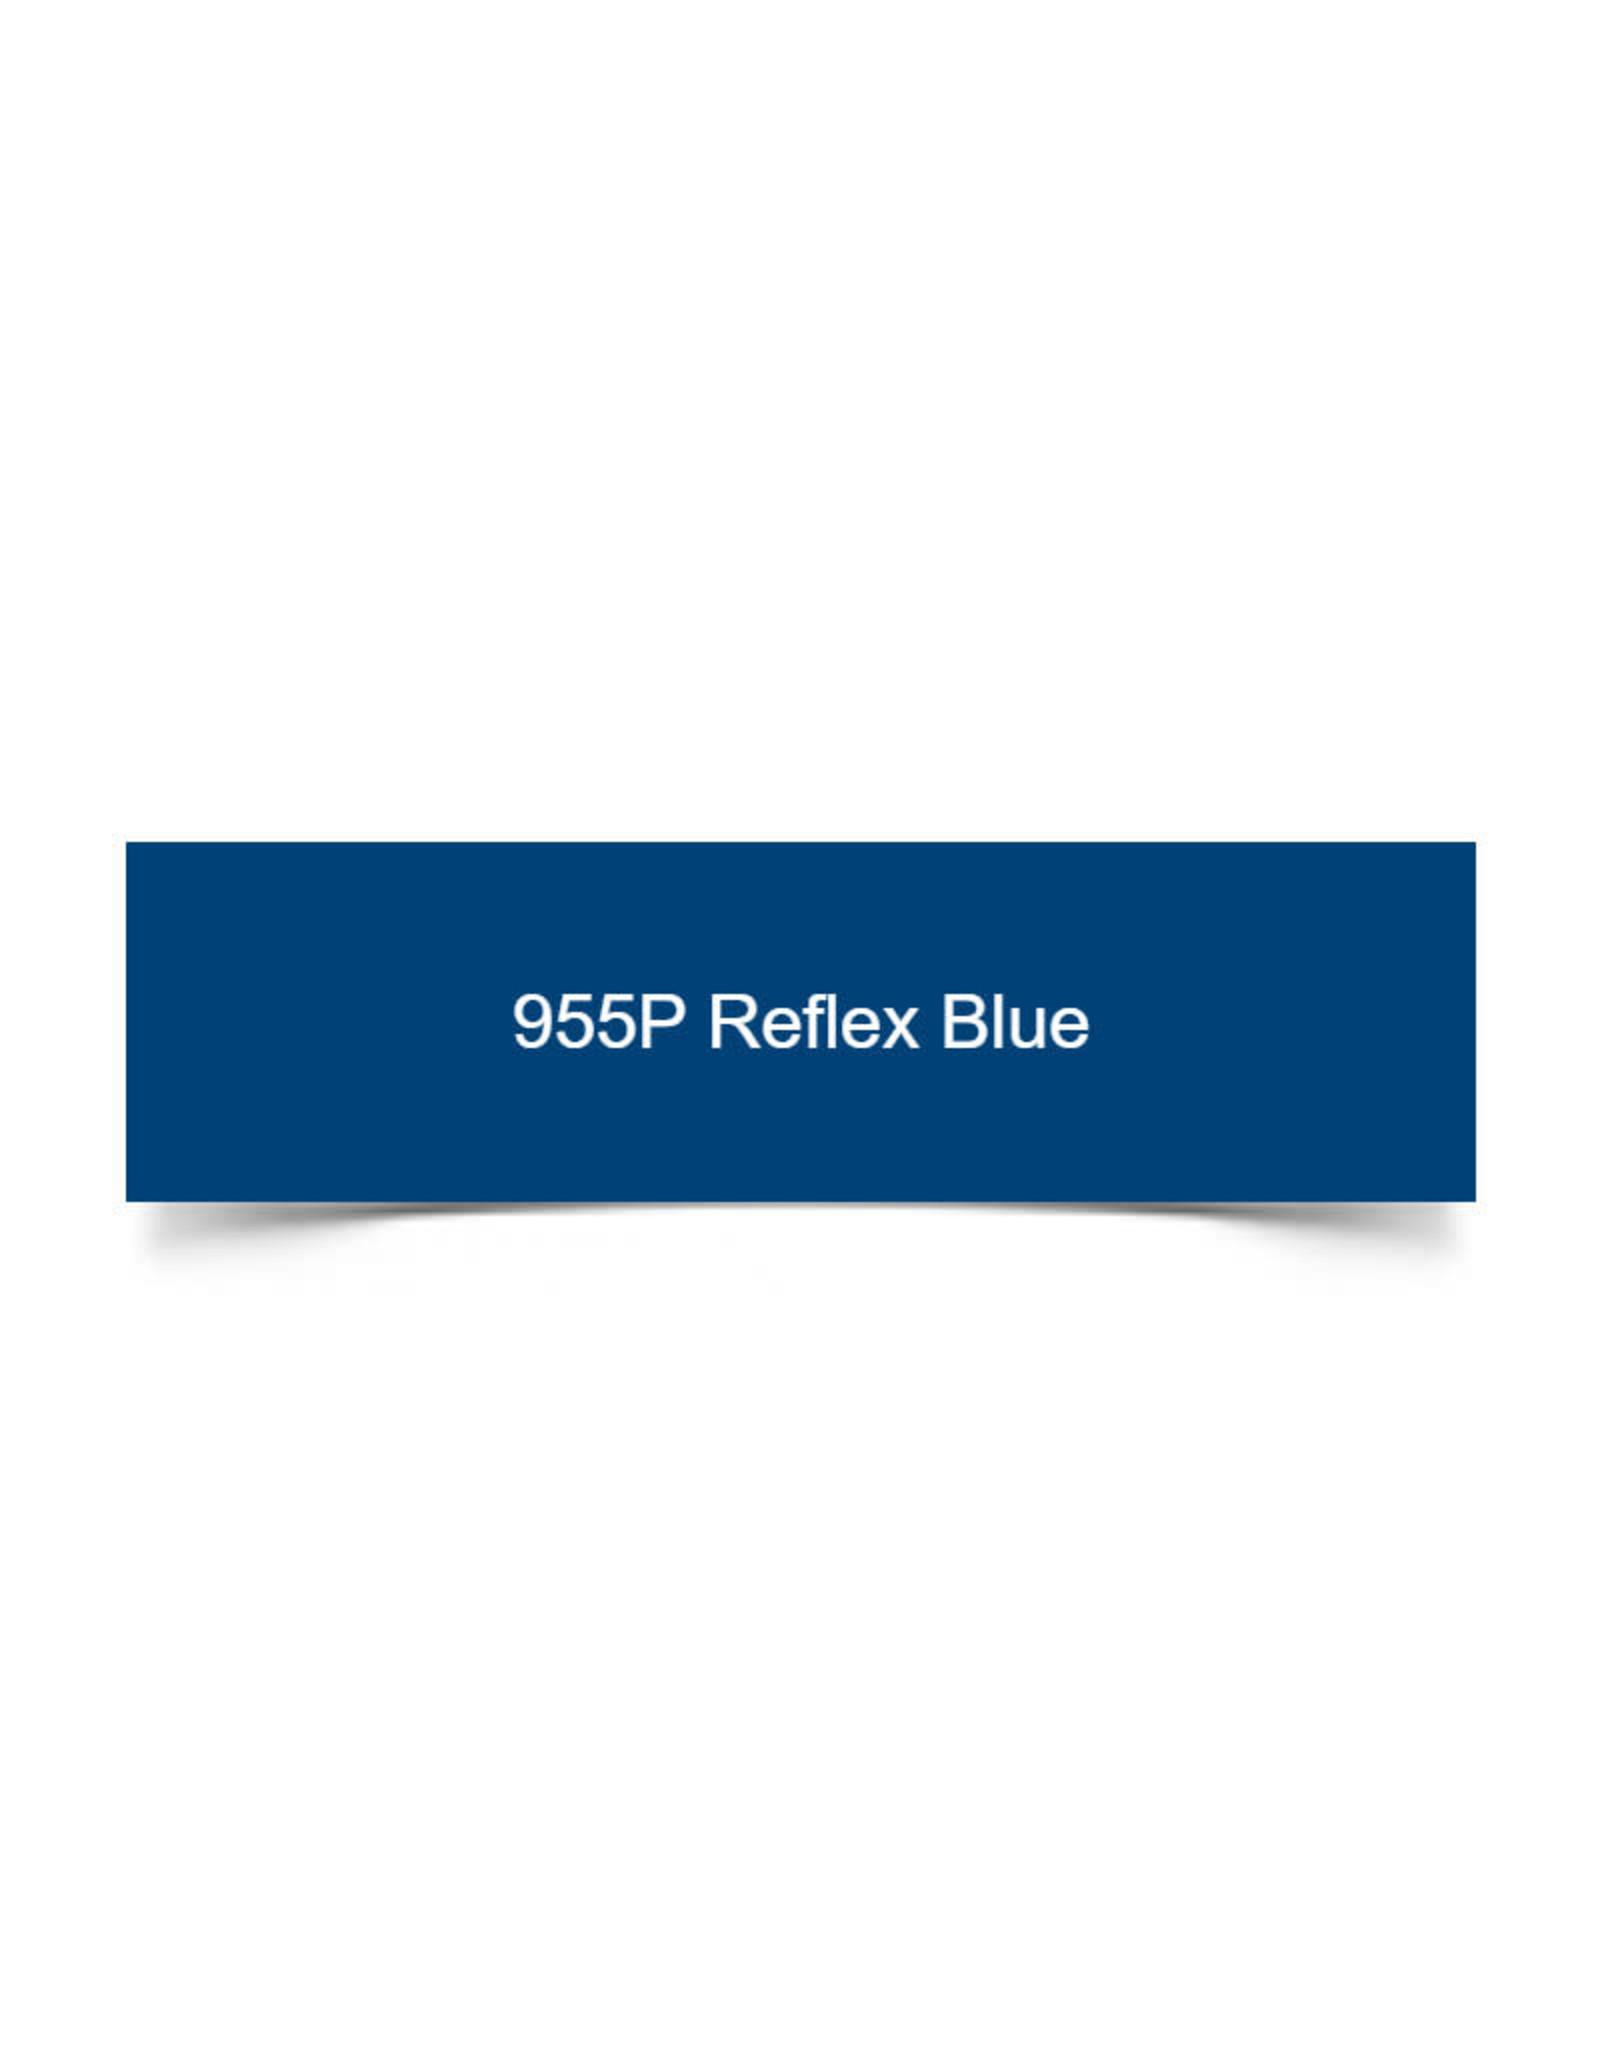 1 Shot 1 Shot Pearlescent Enamels 237 ml - 955P Reflex Blue